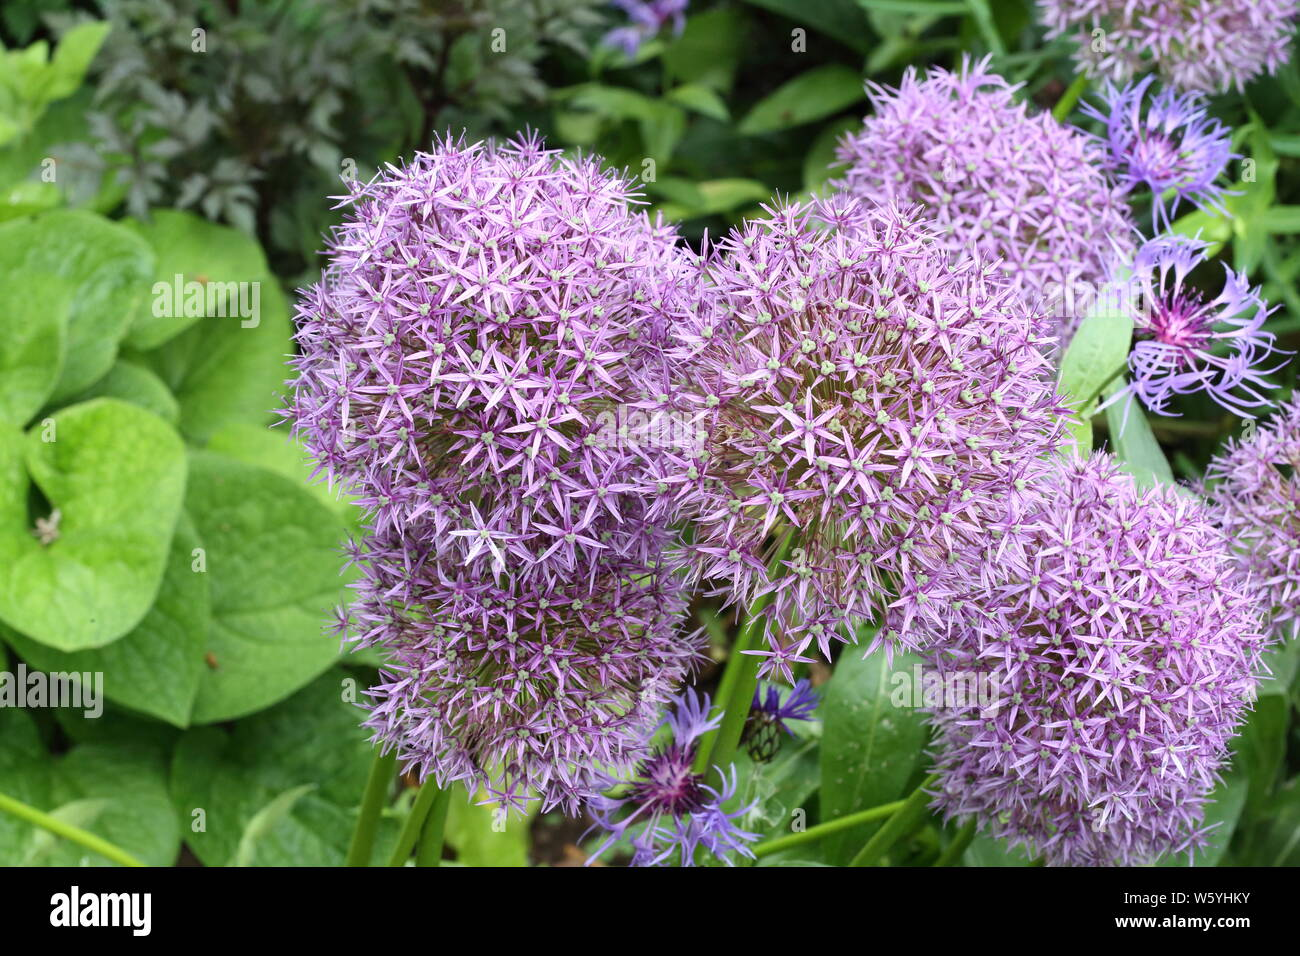 Open ball flower heads of allium plants Stock Photo